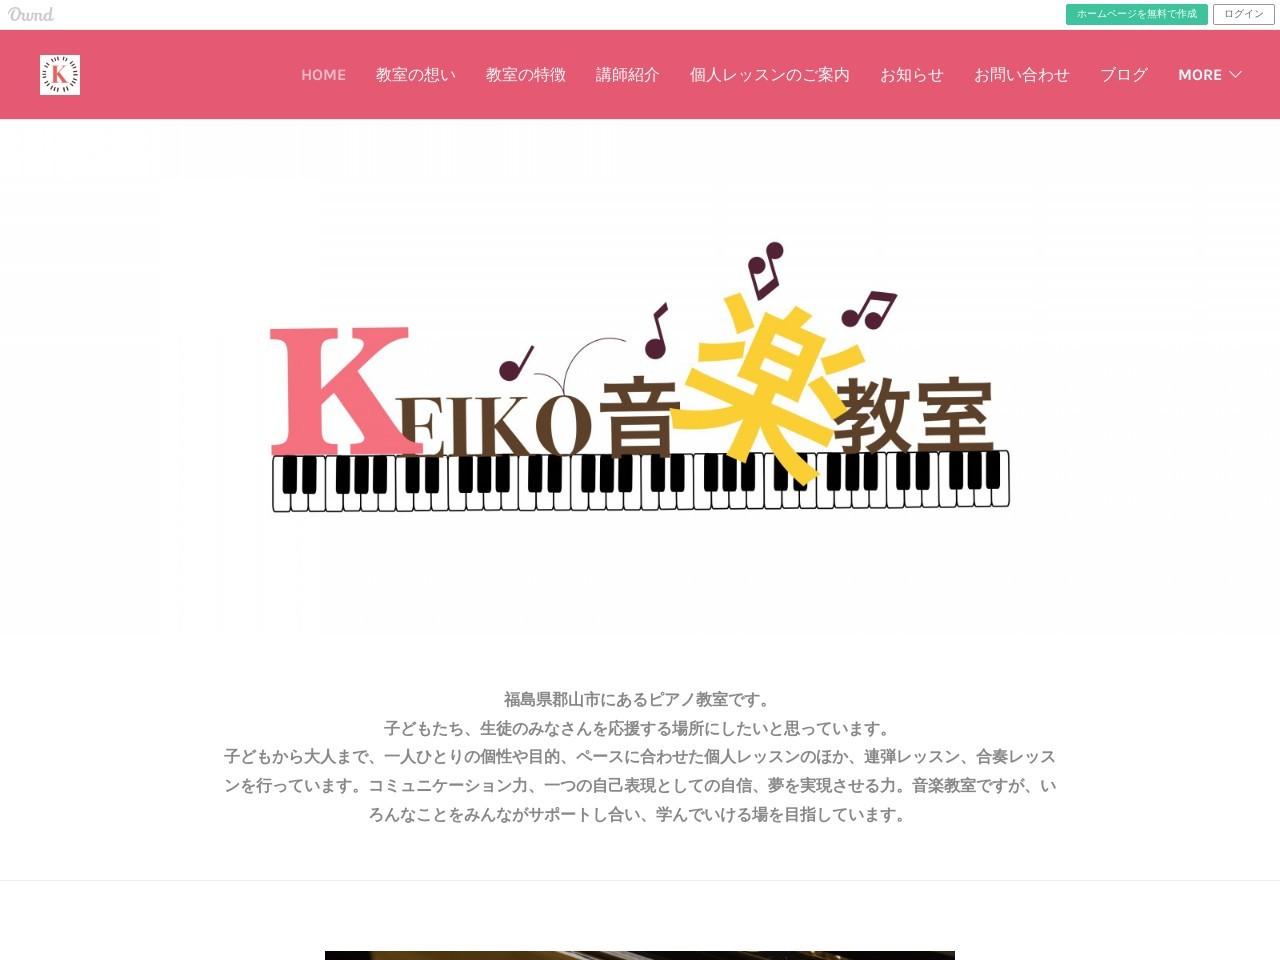 KEIKO音楽教室のサムネイル